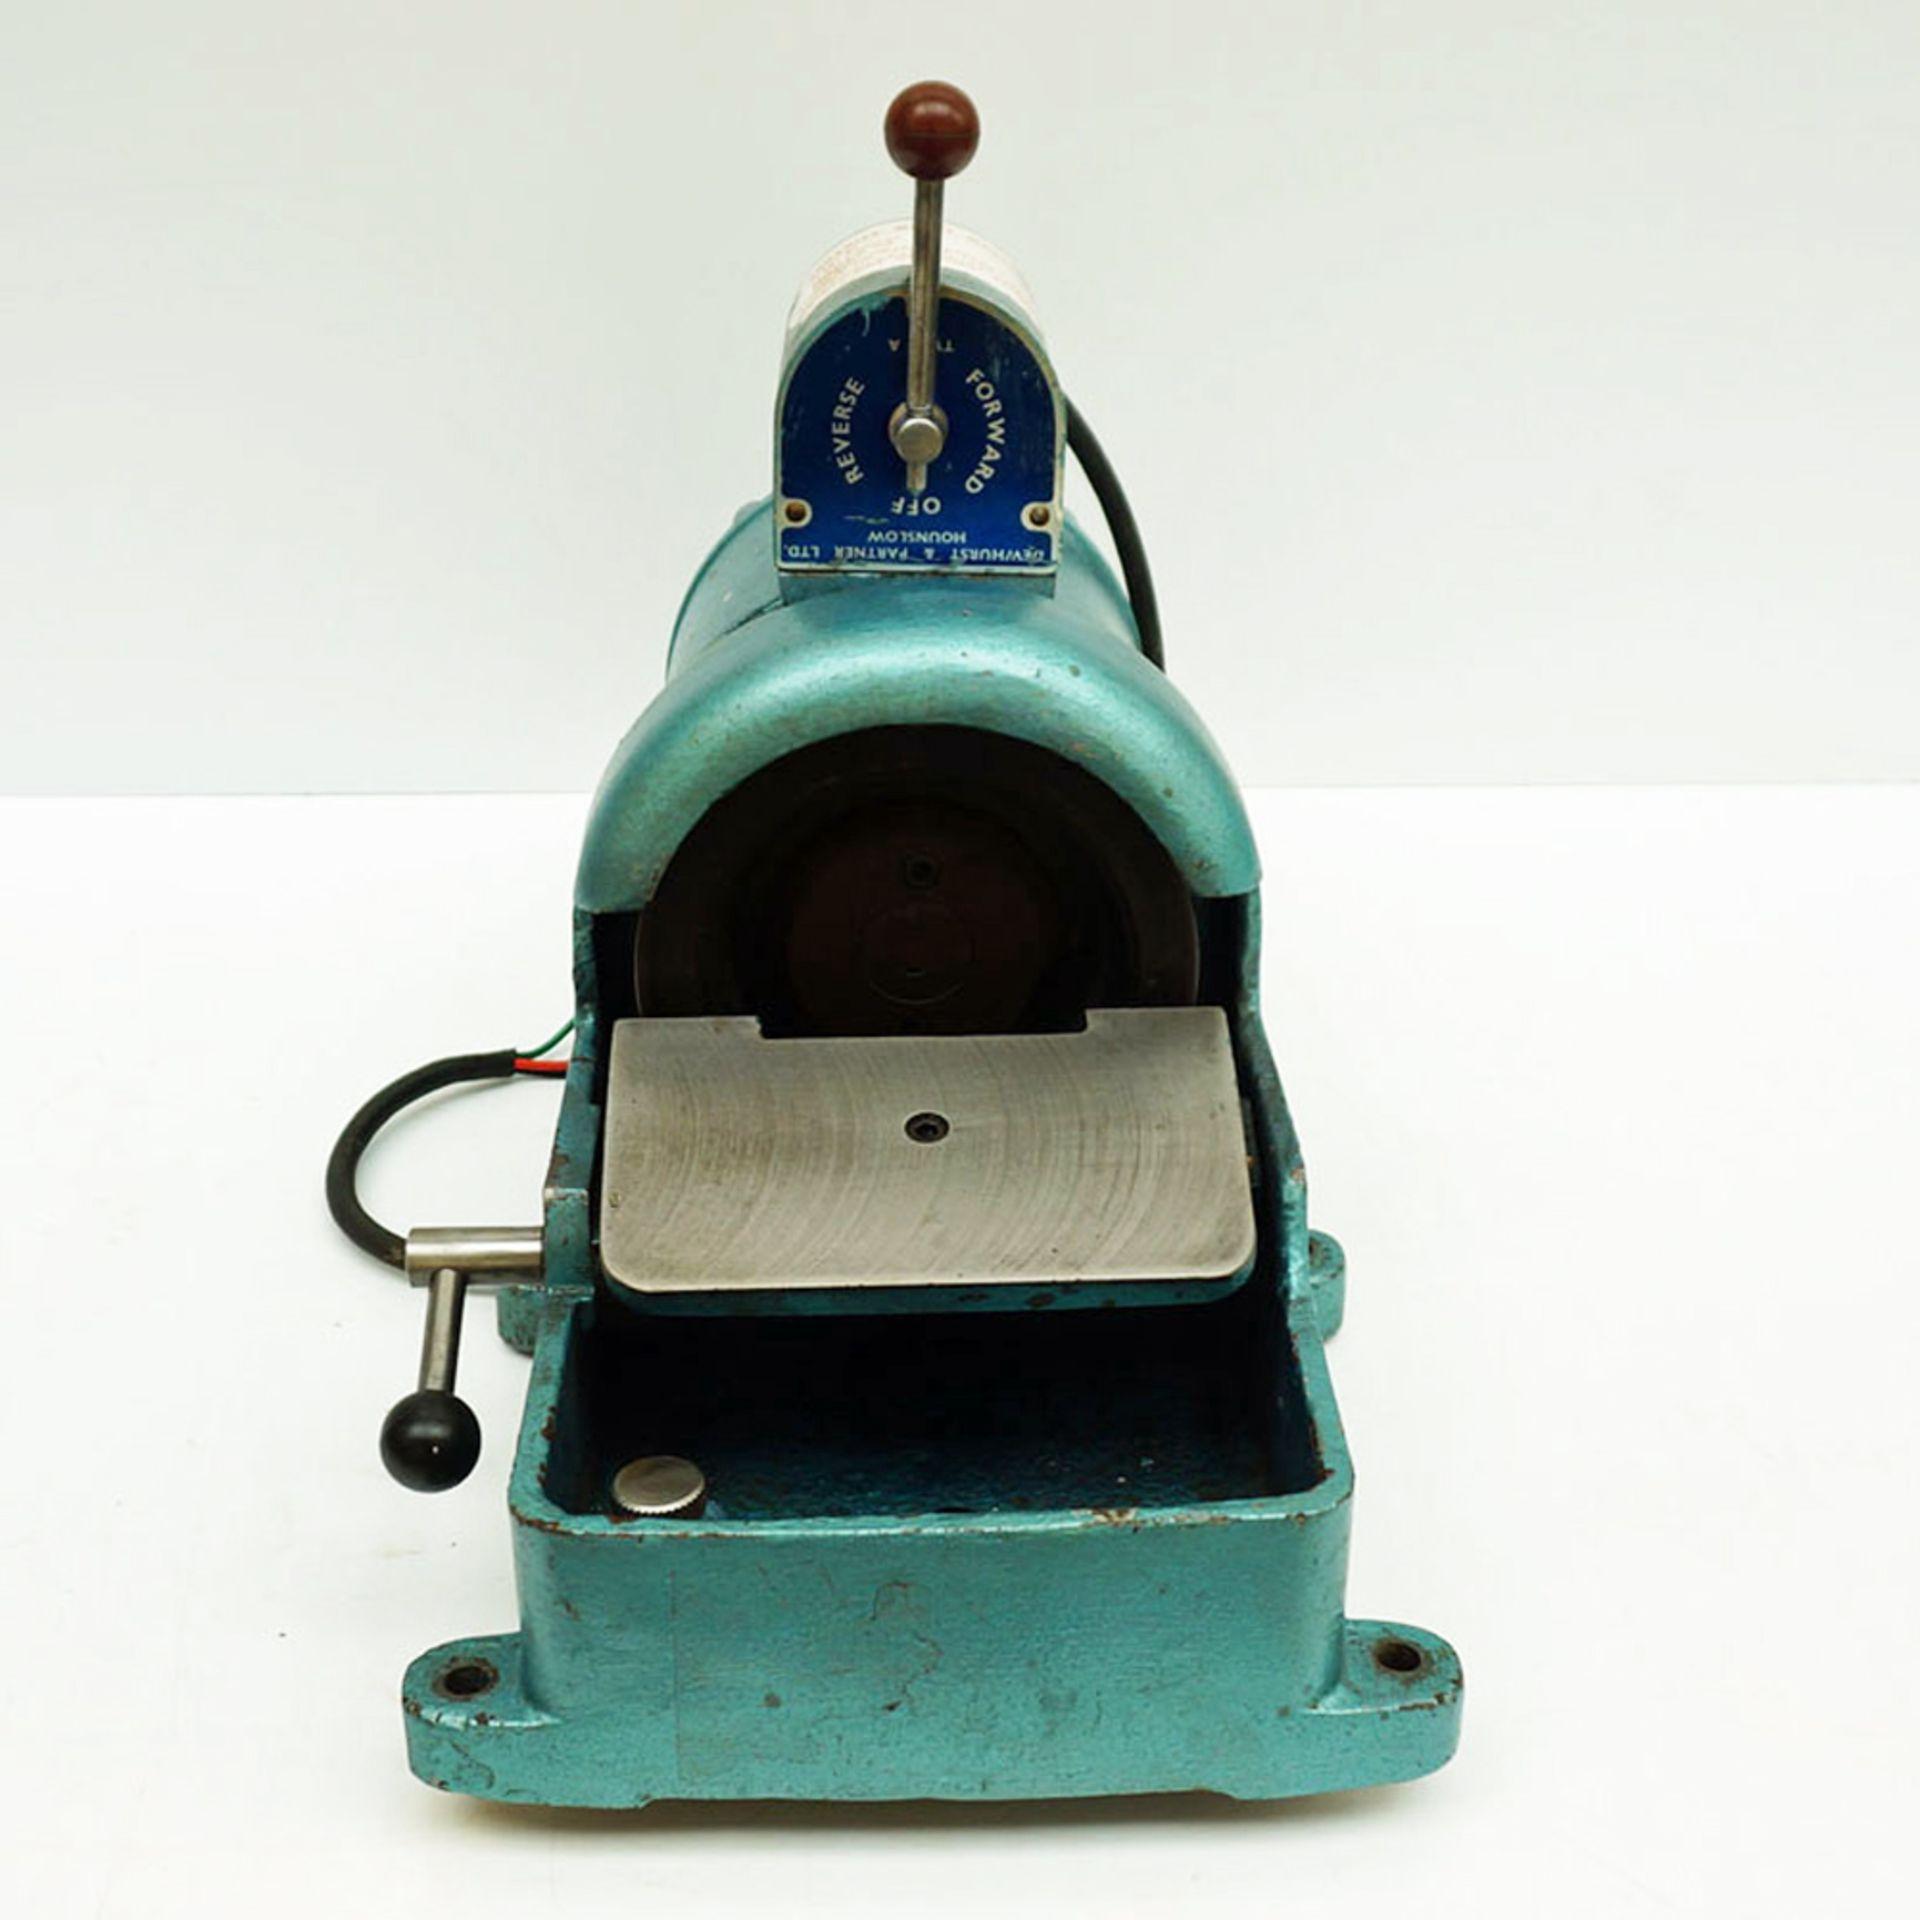 RJH Trim Tool Bench Top Lapper. - Image 3 of 4